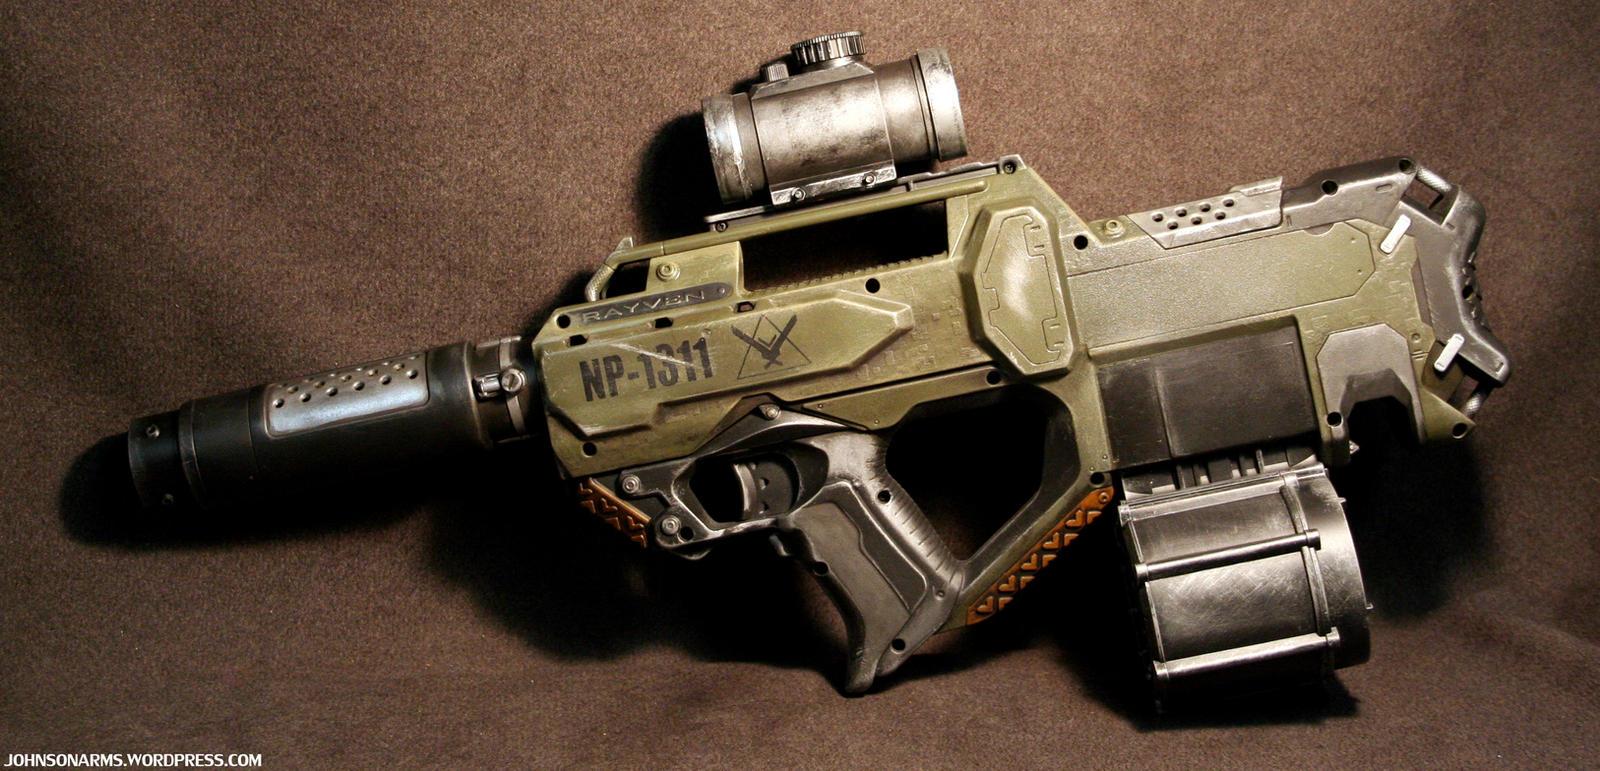 HALO Themed Nerf Rayven by JohnsonArms